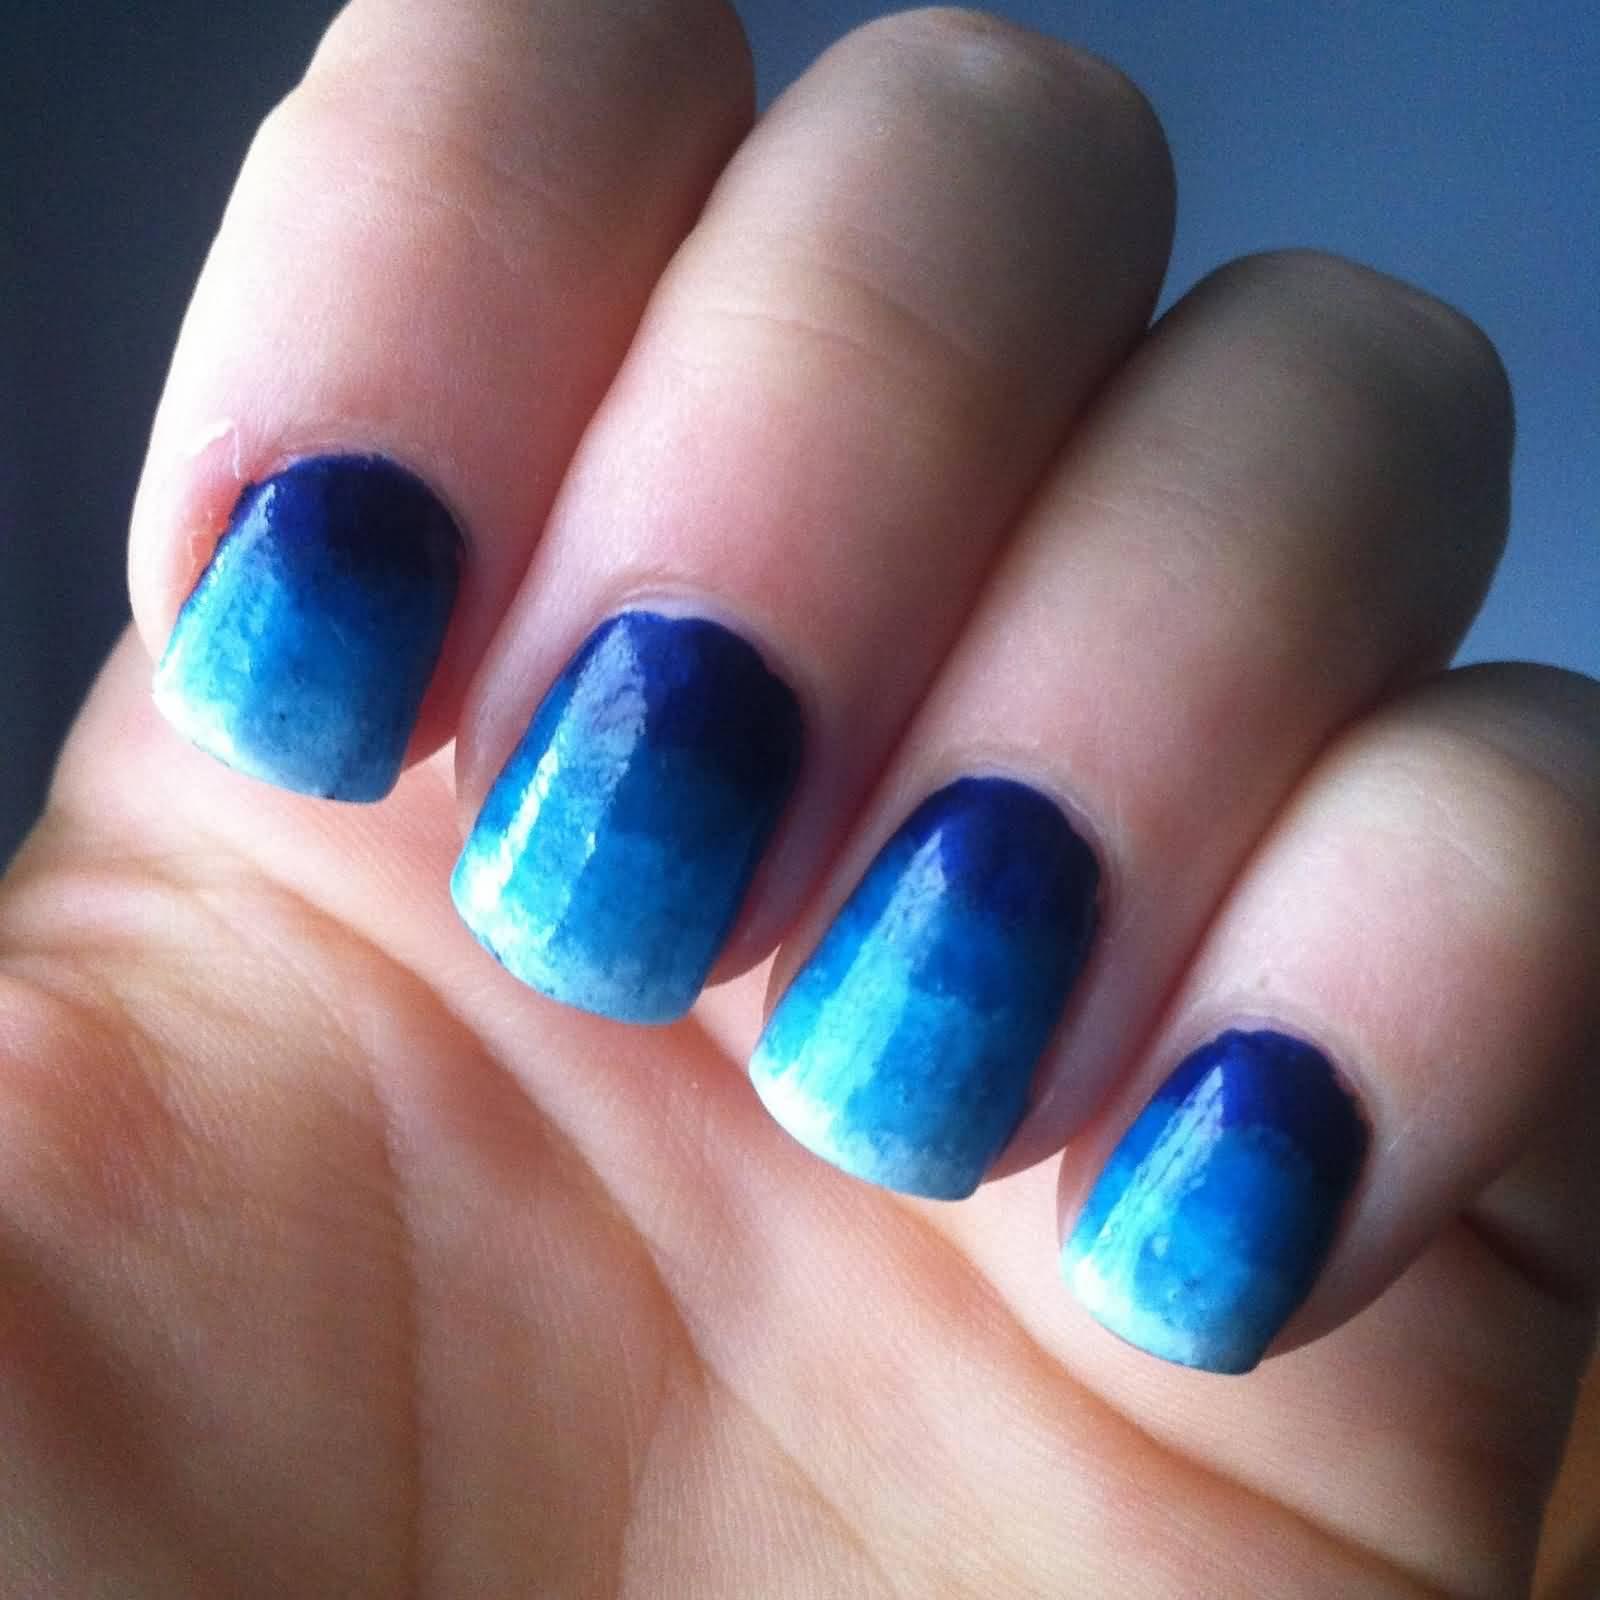 Blue Nail Art Ideas: 50+ Best Blue Nail Art Design Ideas